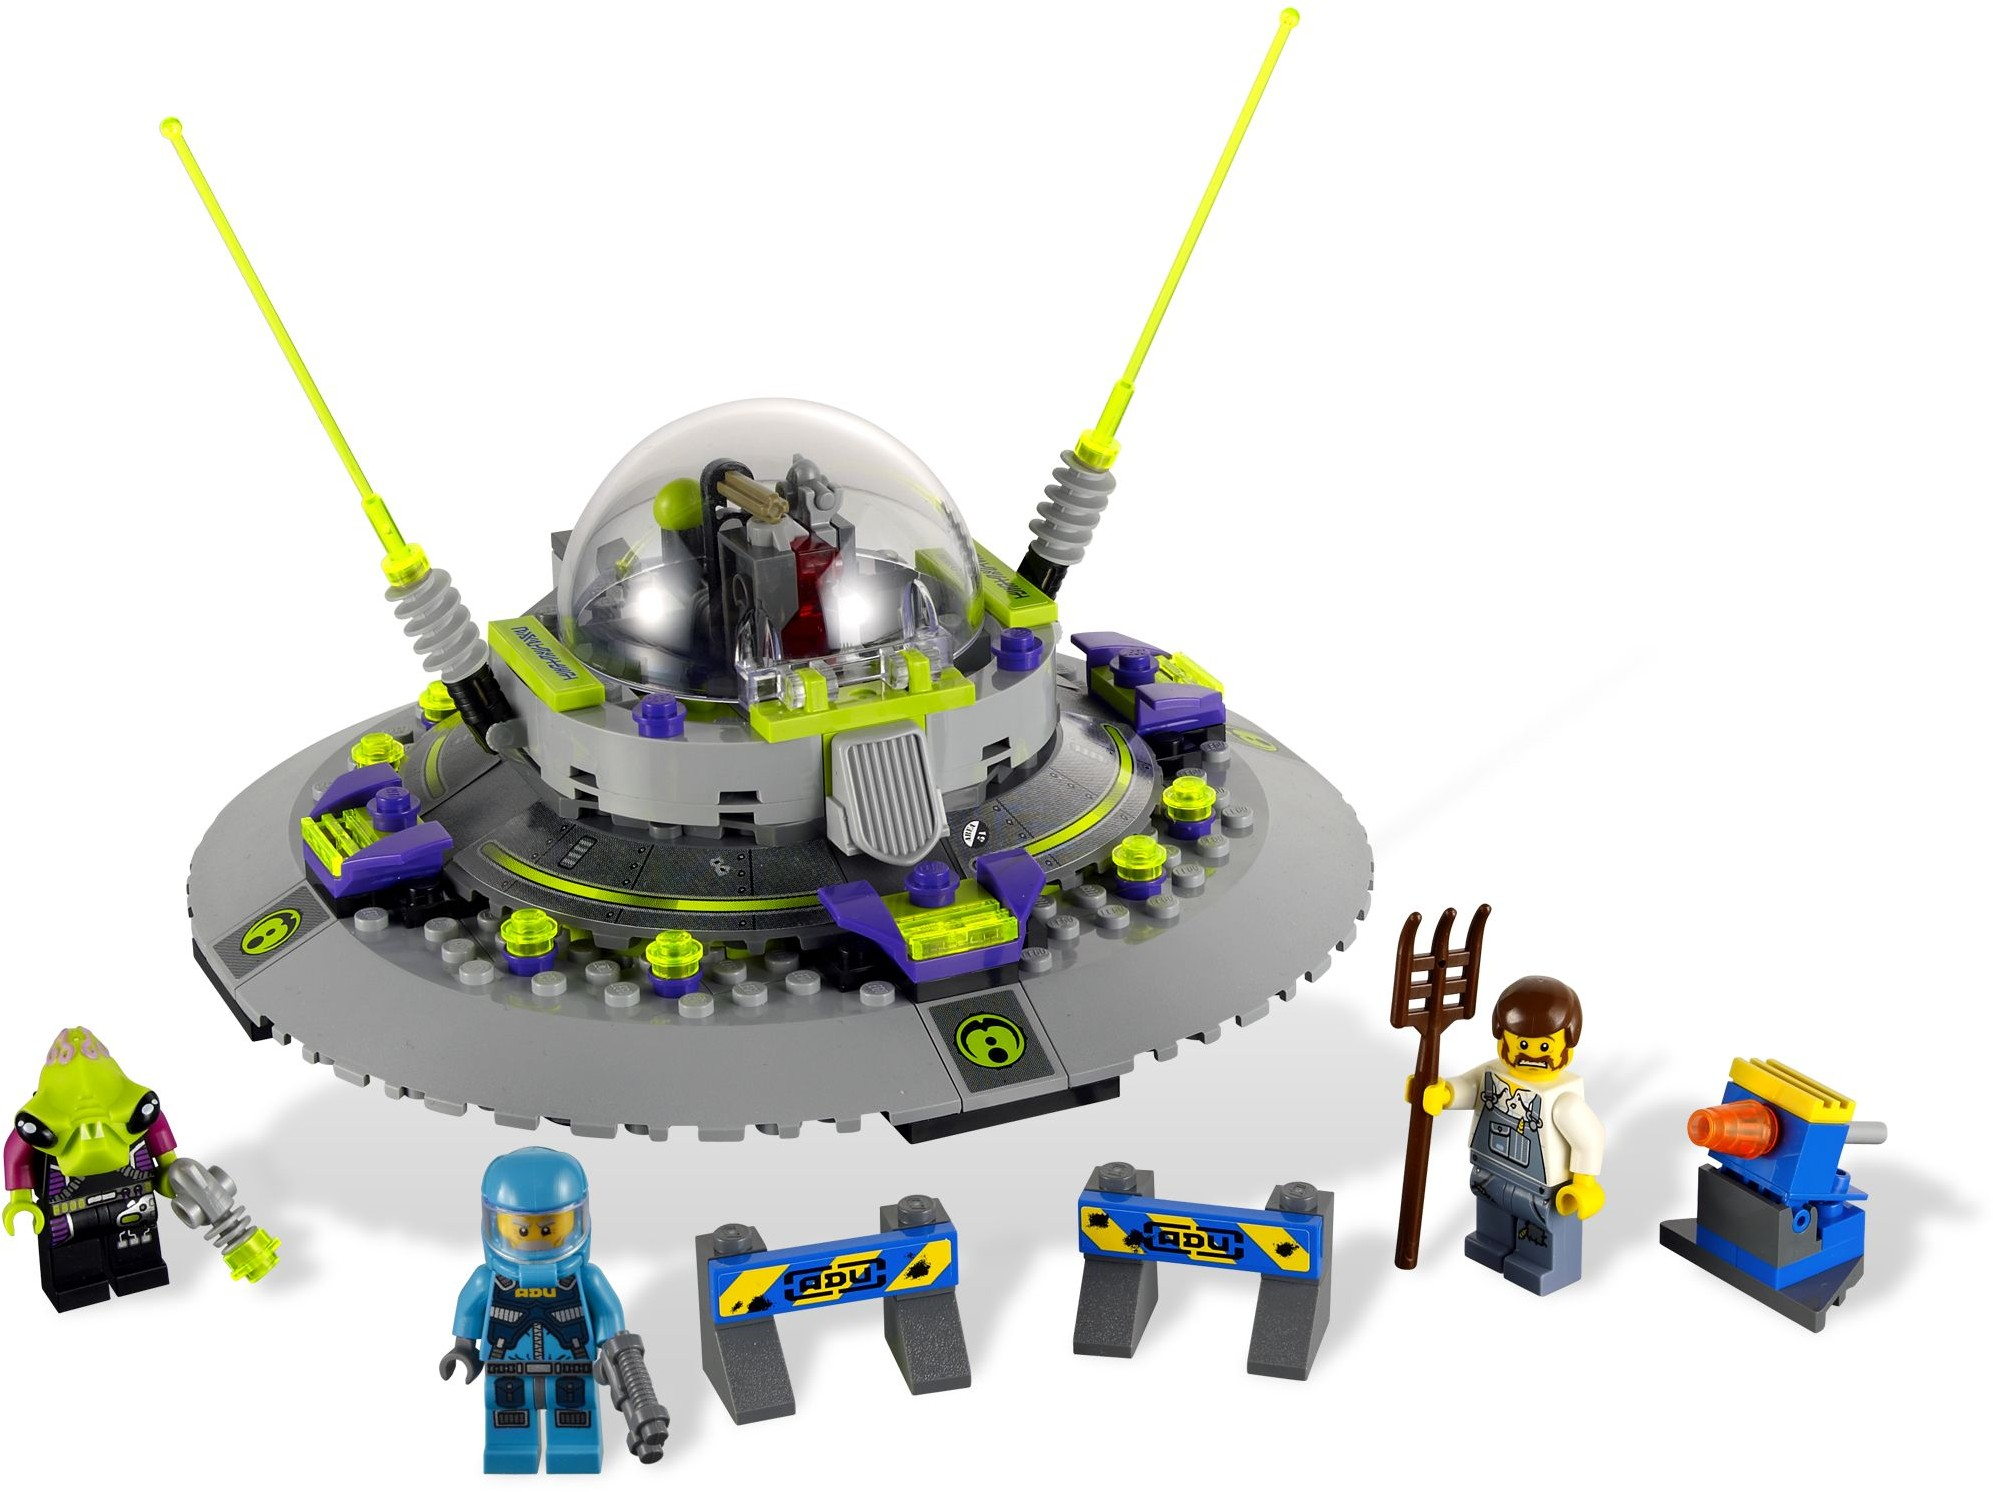 ALIEN MOTHERSHIP ATTACKS LEGO CITY! - Brick Rigs ... |Lego Alien Invasion